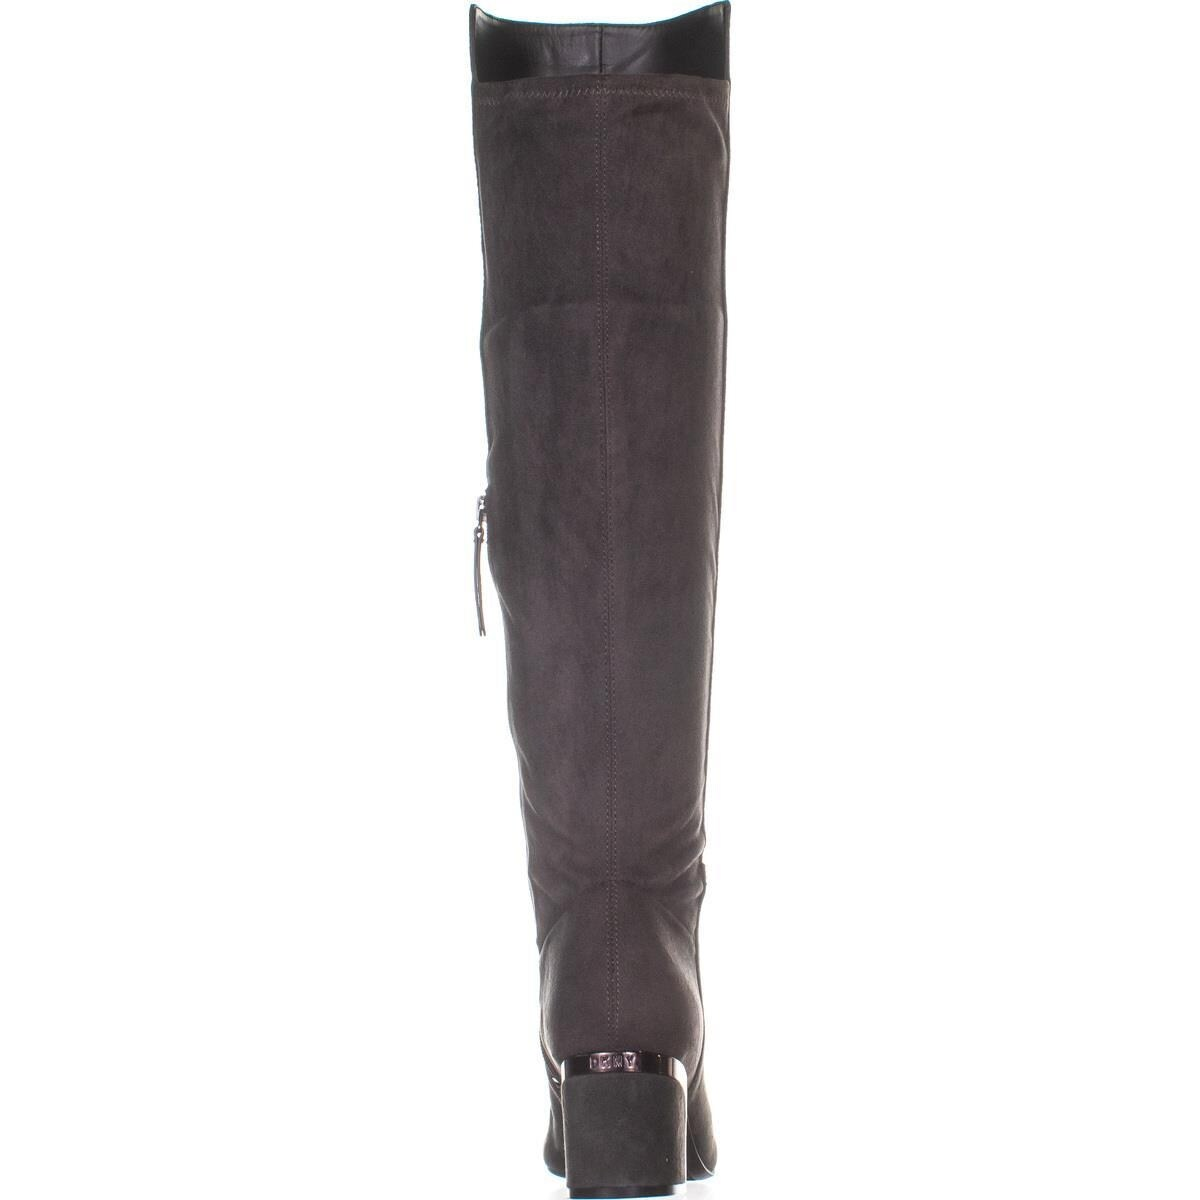 13930221e27 Shop DKNY Cora Low-Heel Knee High Boots